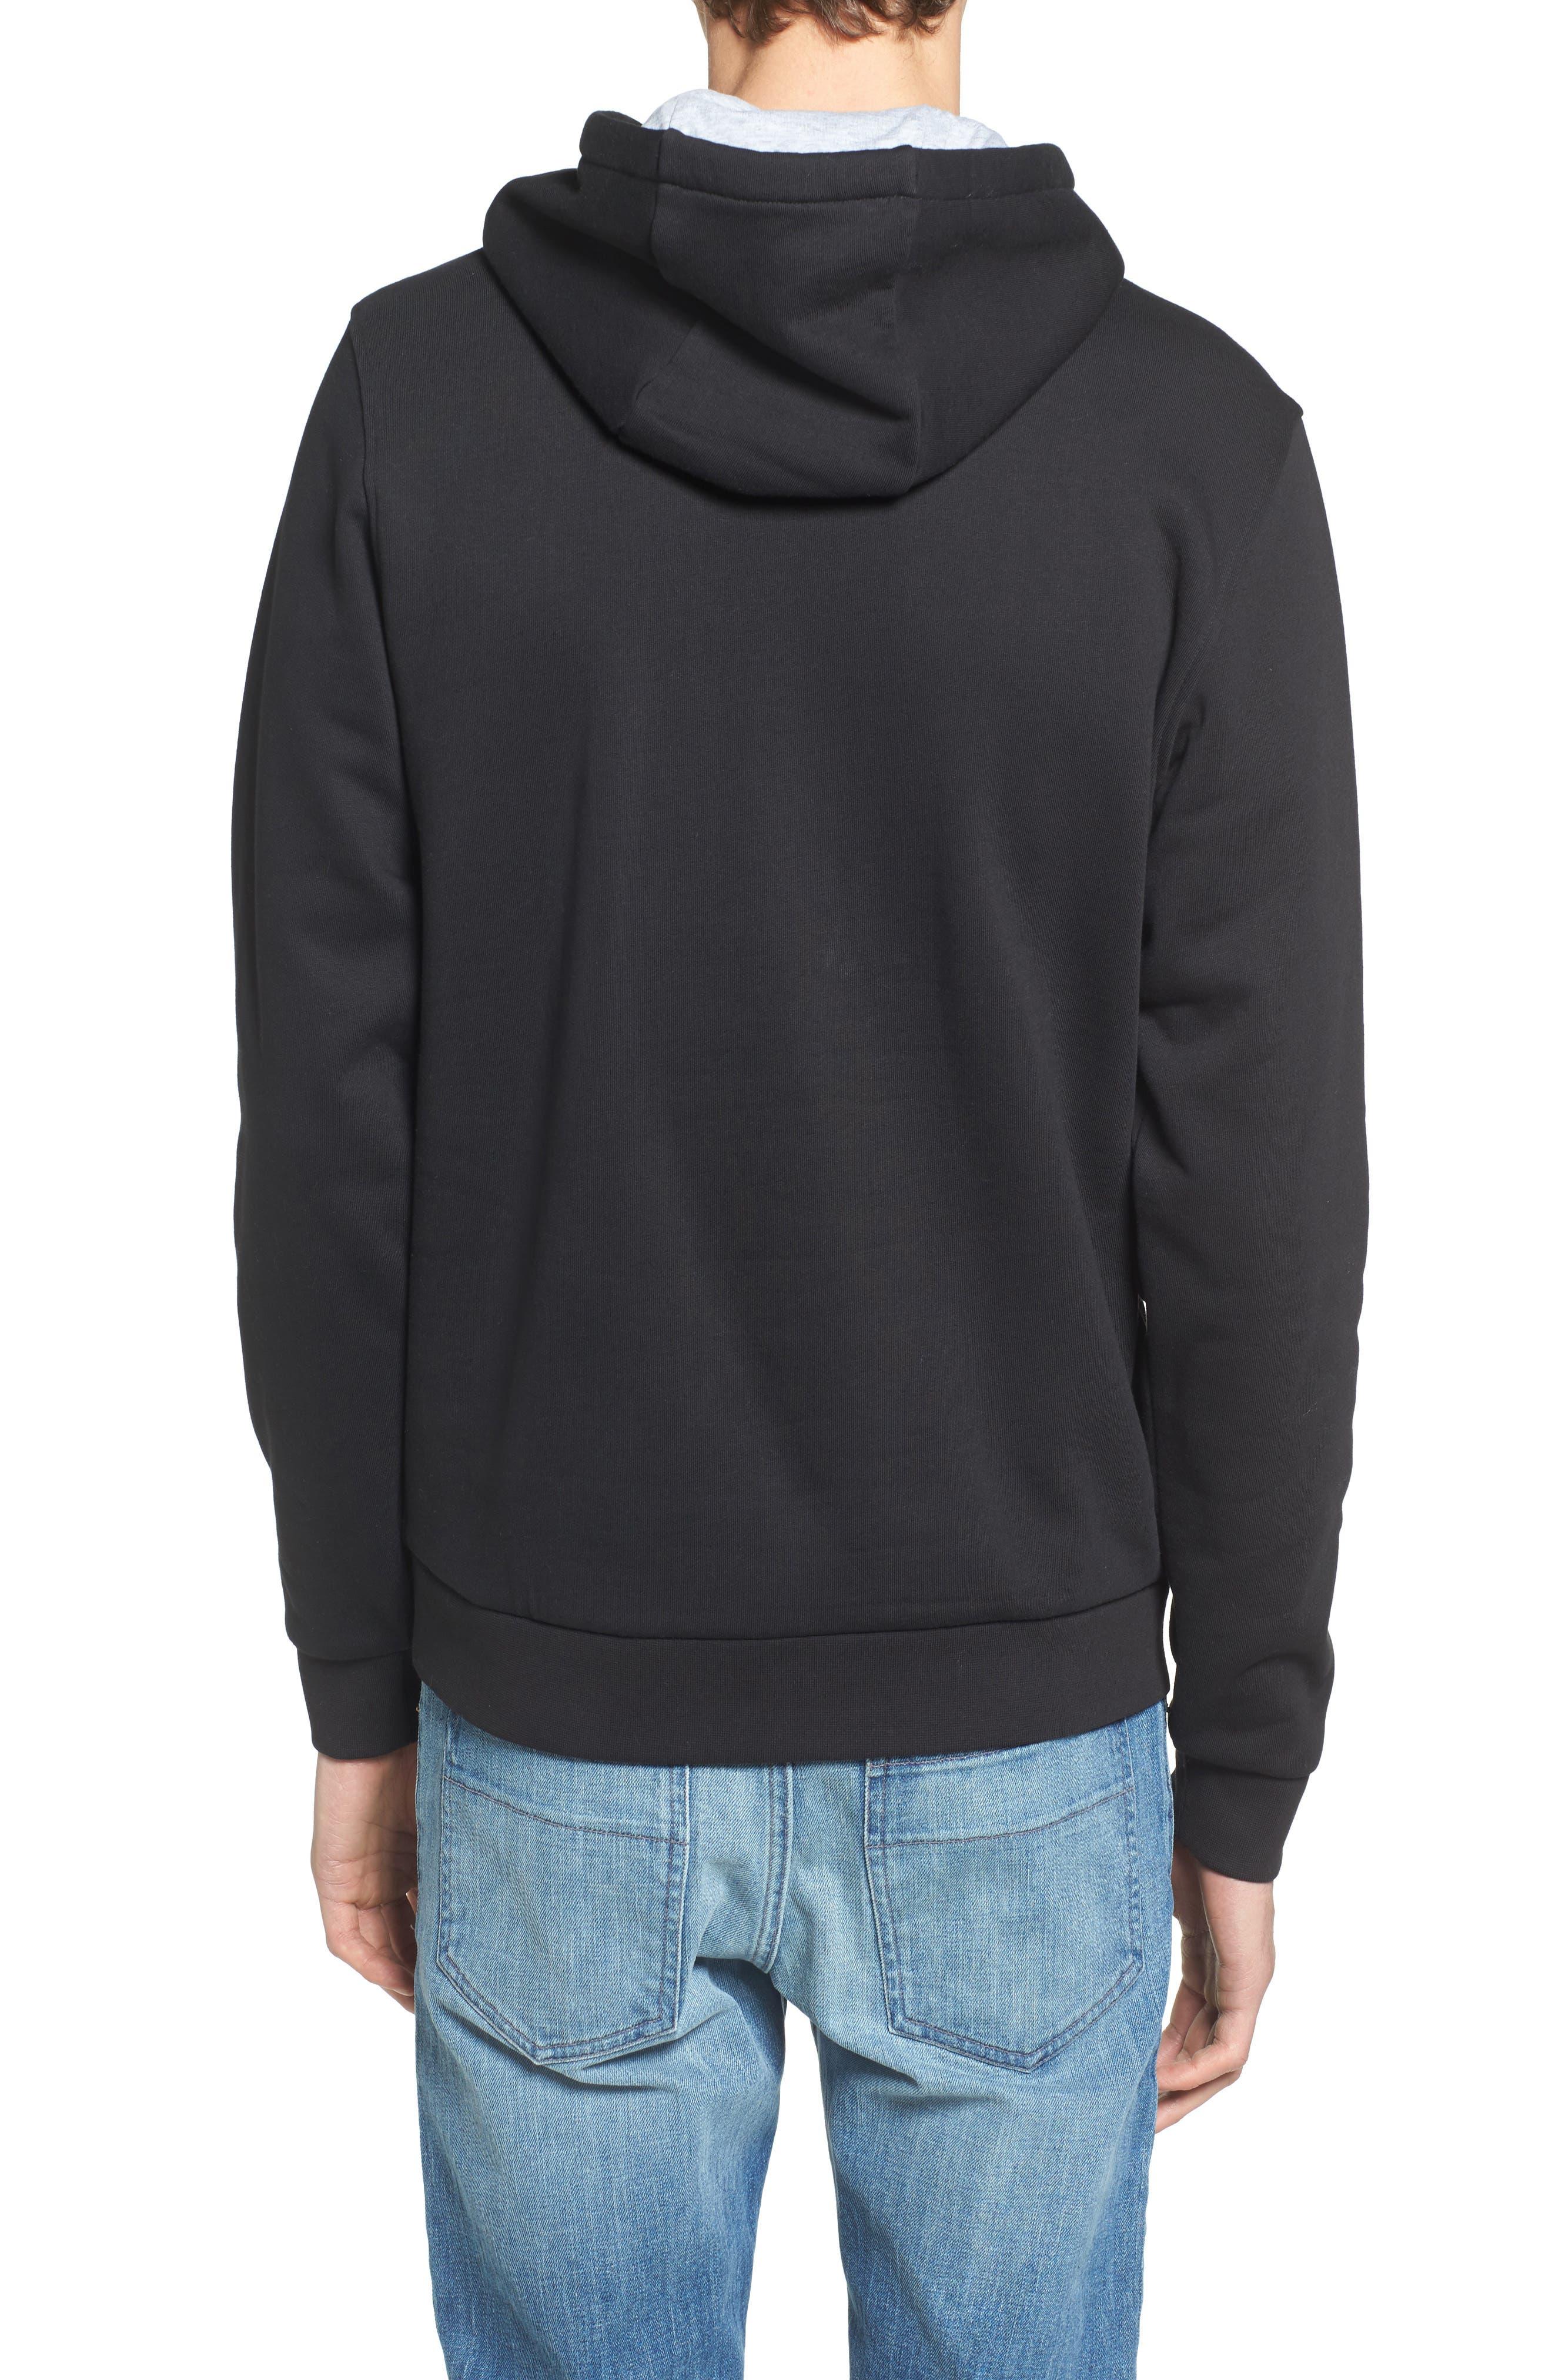 Sport Cotton Blend Hoodie,                             Alternate thumbnail 2, color,                             BLACK/ SILVER CHINE